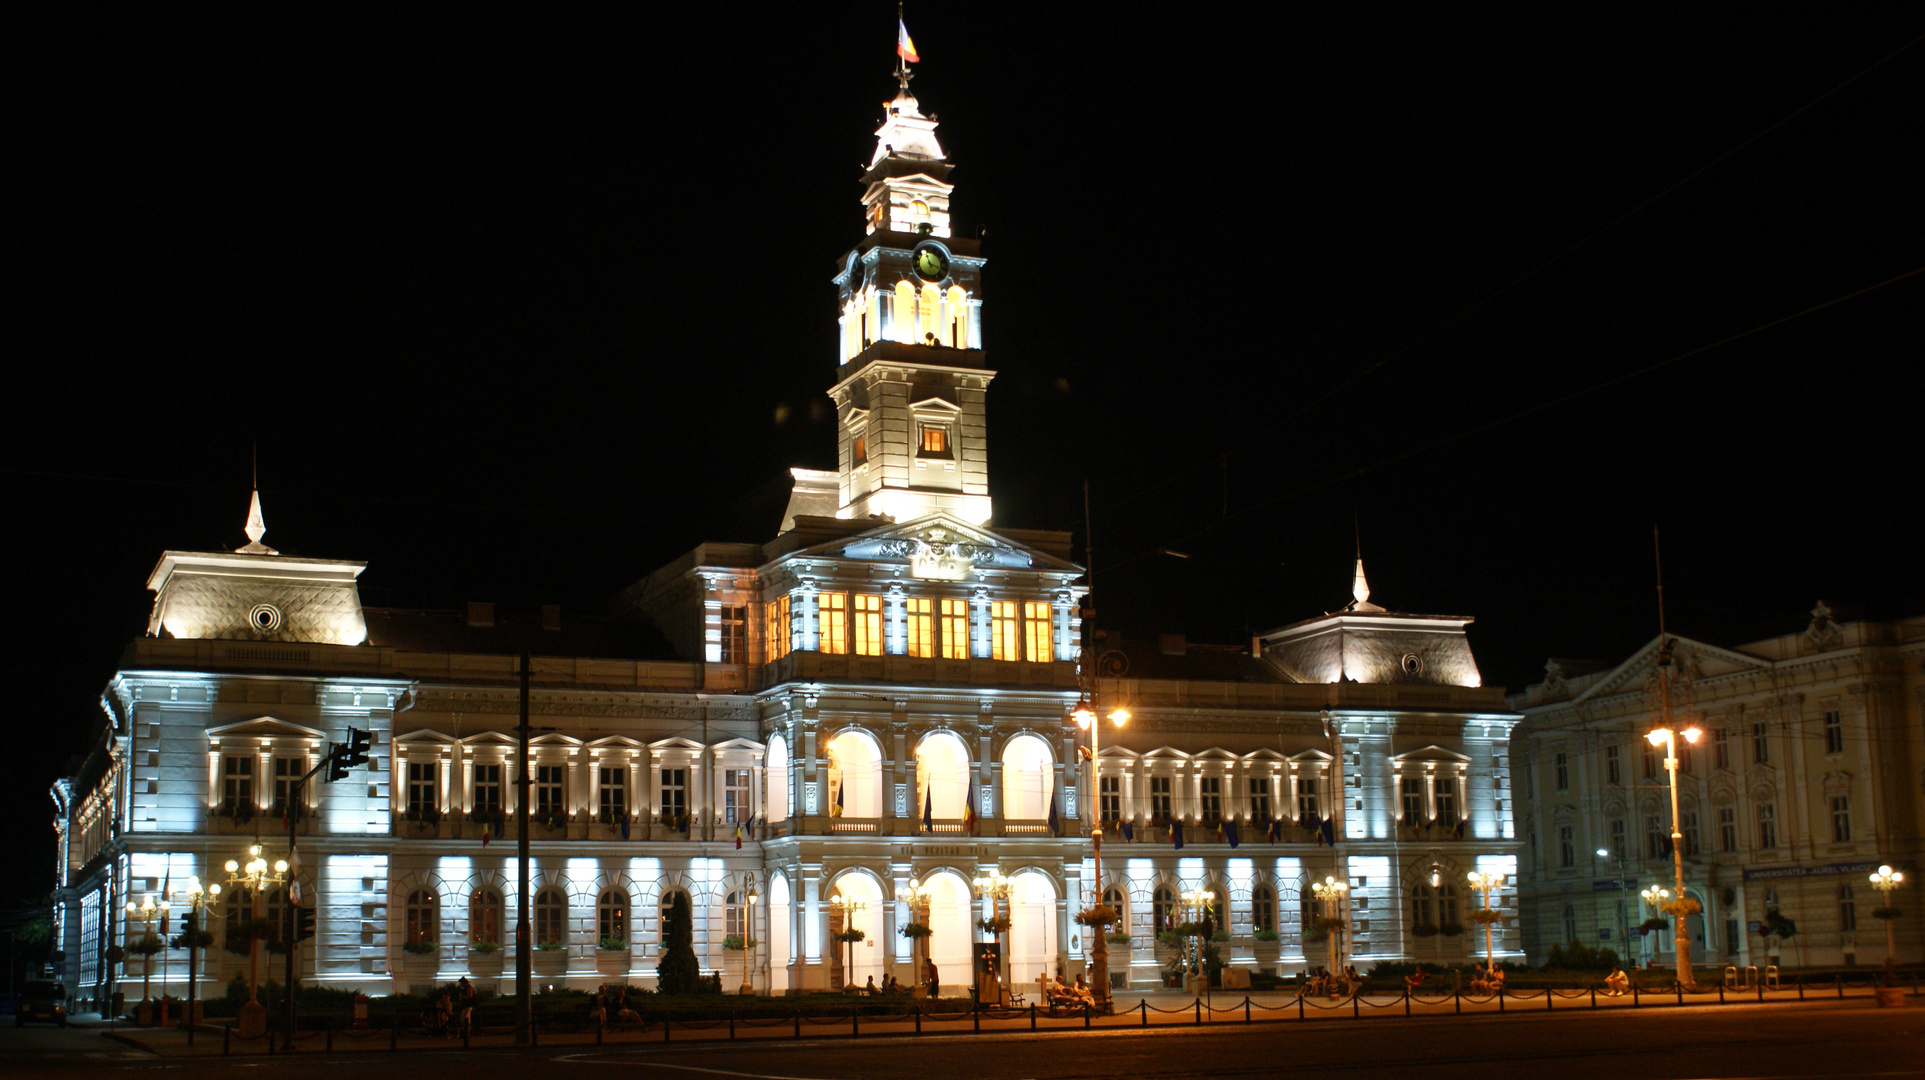 Arad Rumänien rathaus in arad rumänien foto bild architektur architektur bei